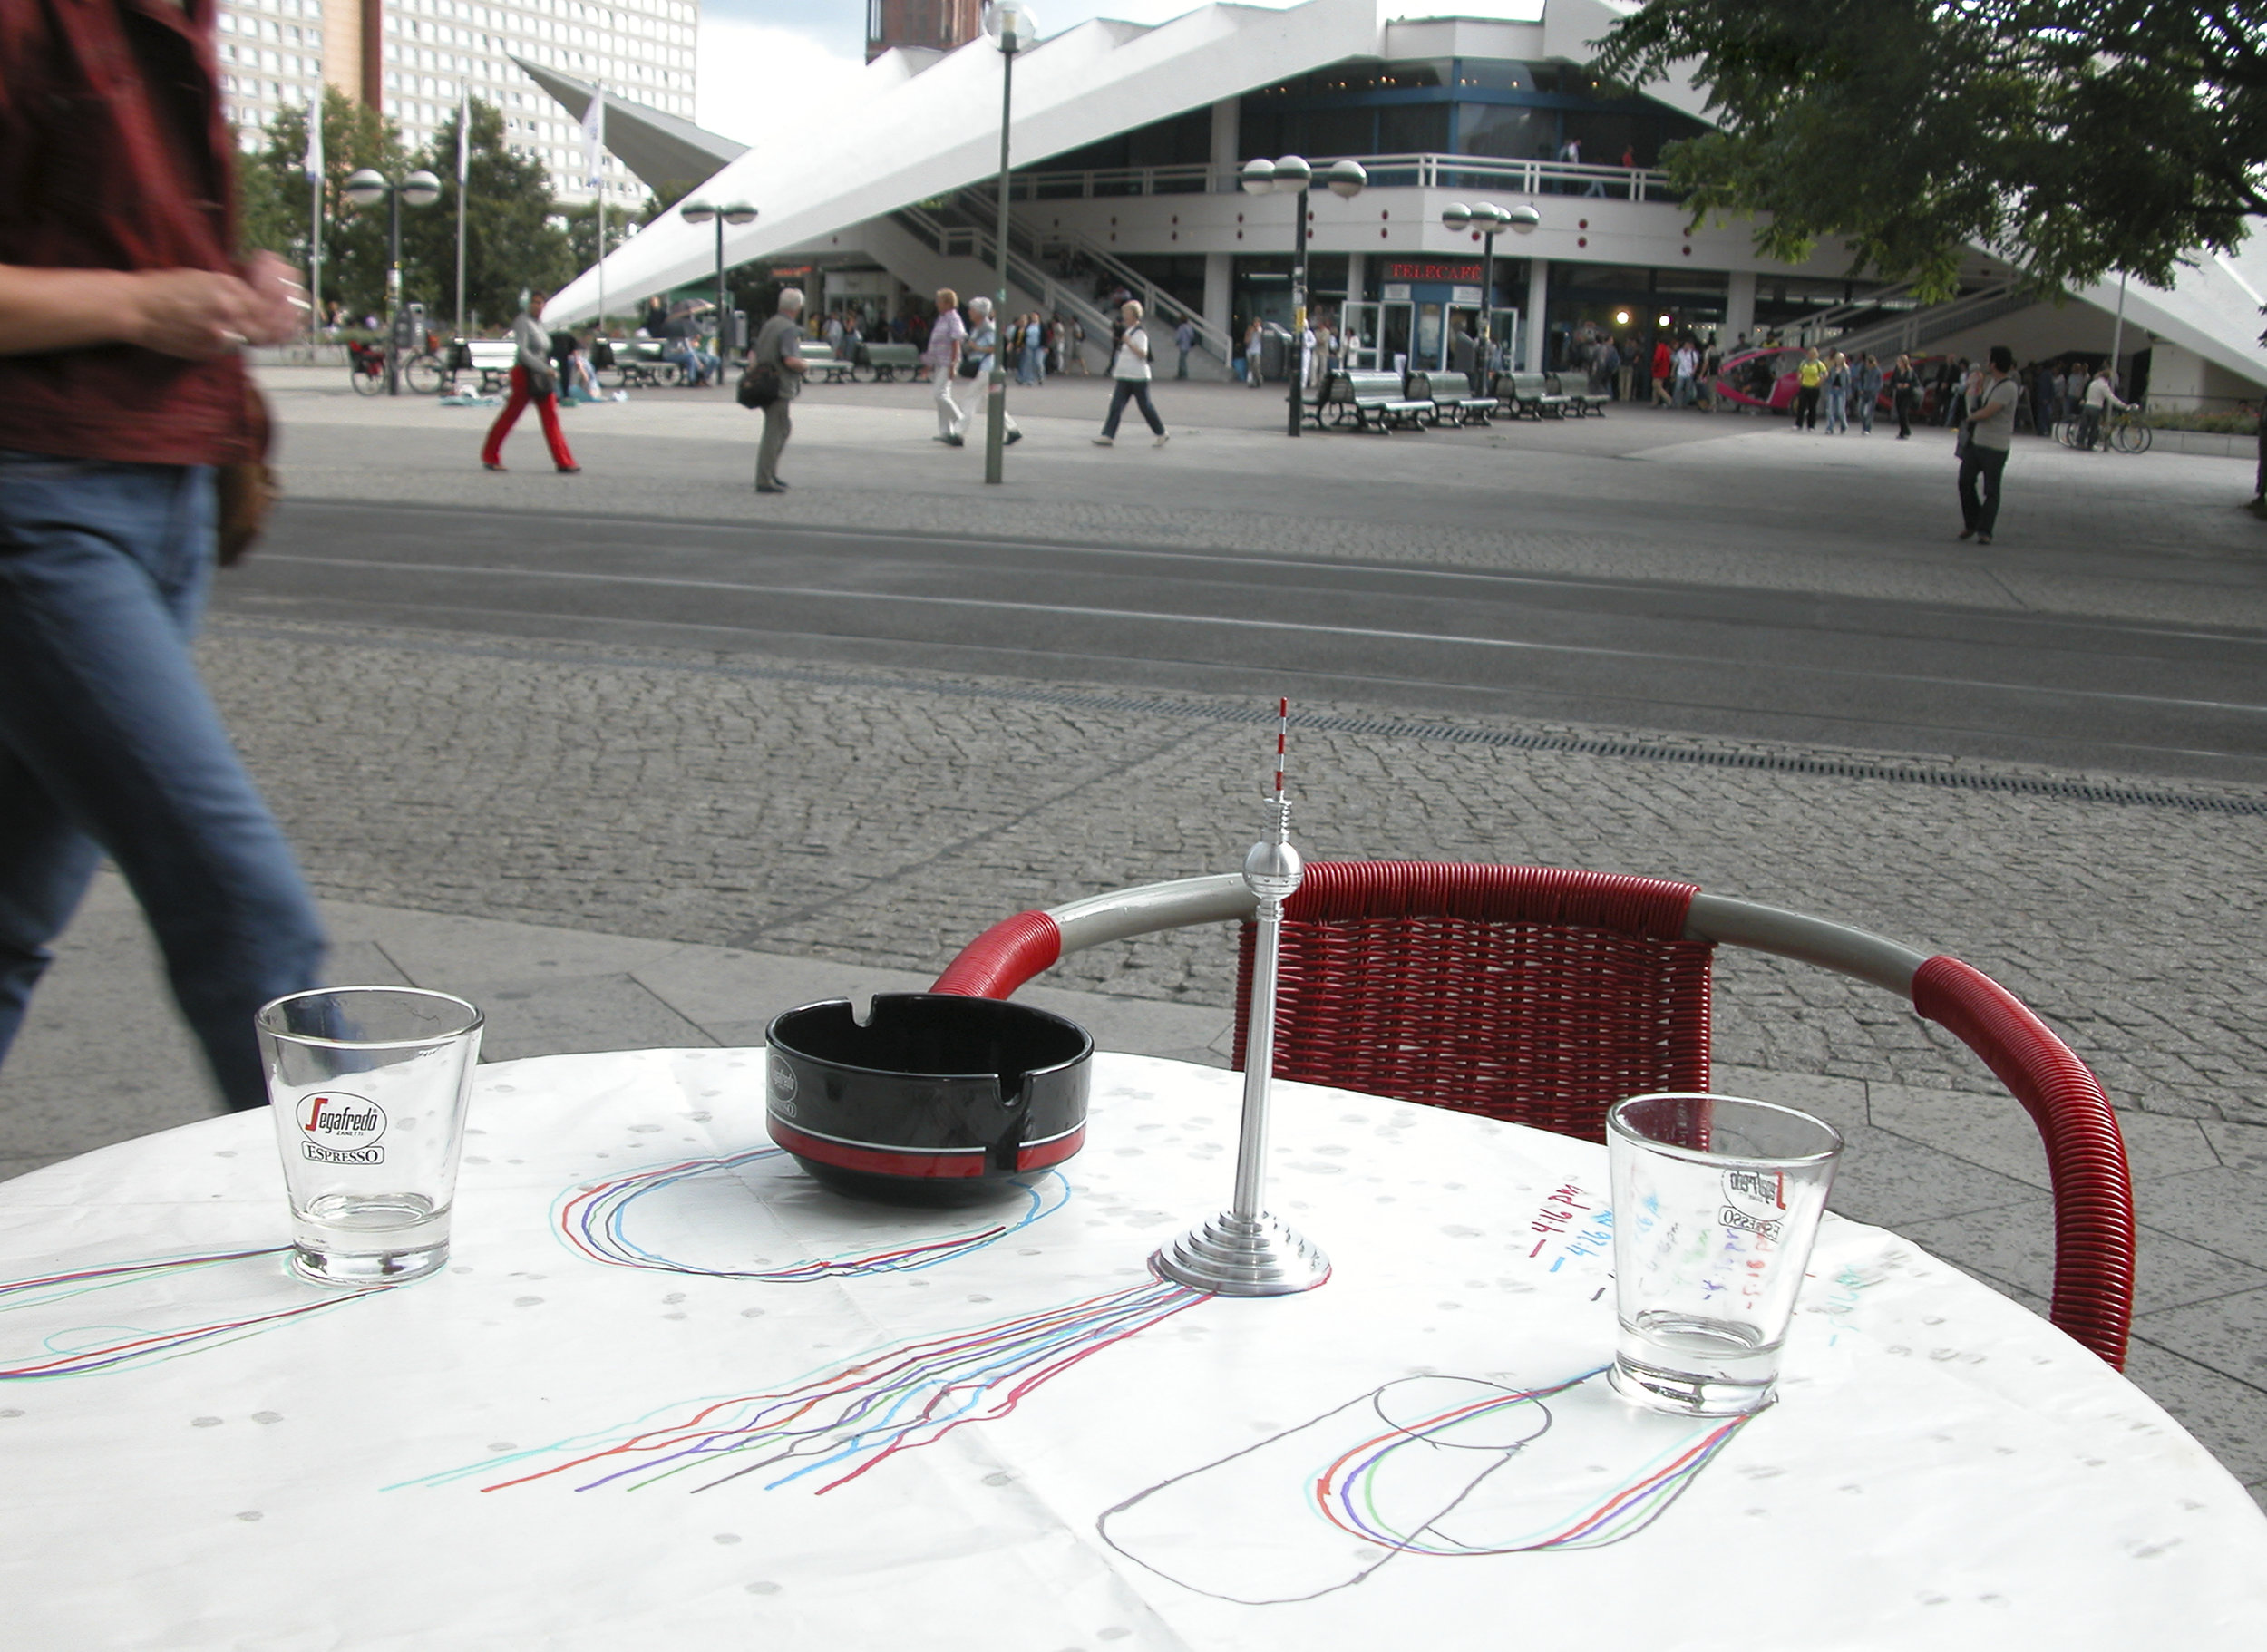 Coffee, Radio Tower, Berlin …August 13, 2004